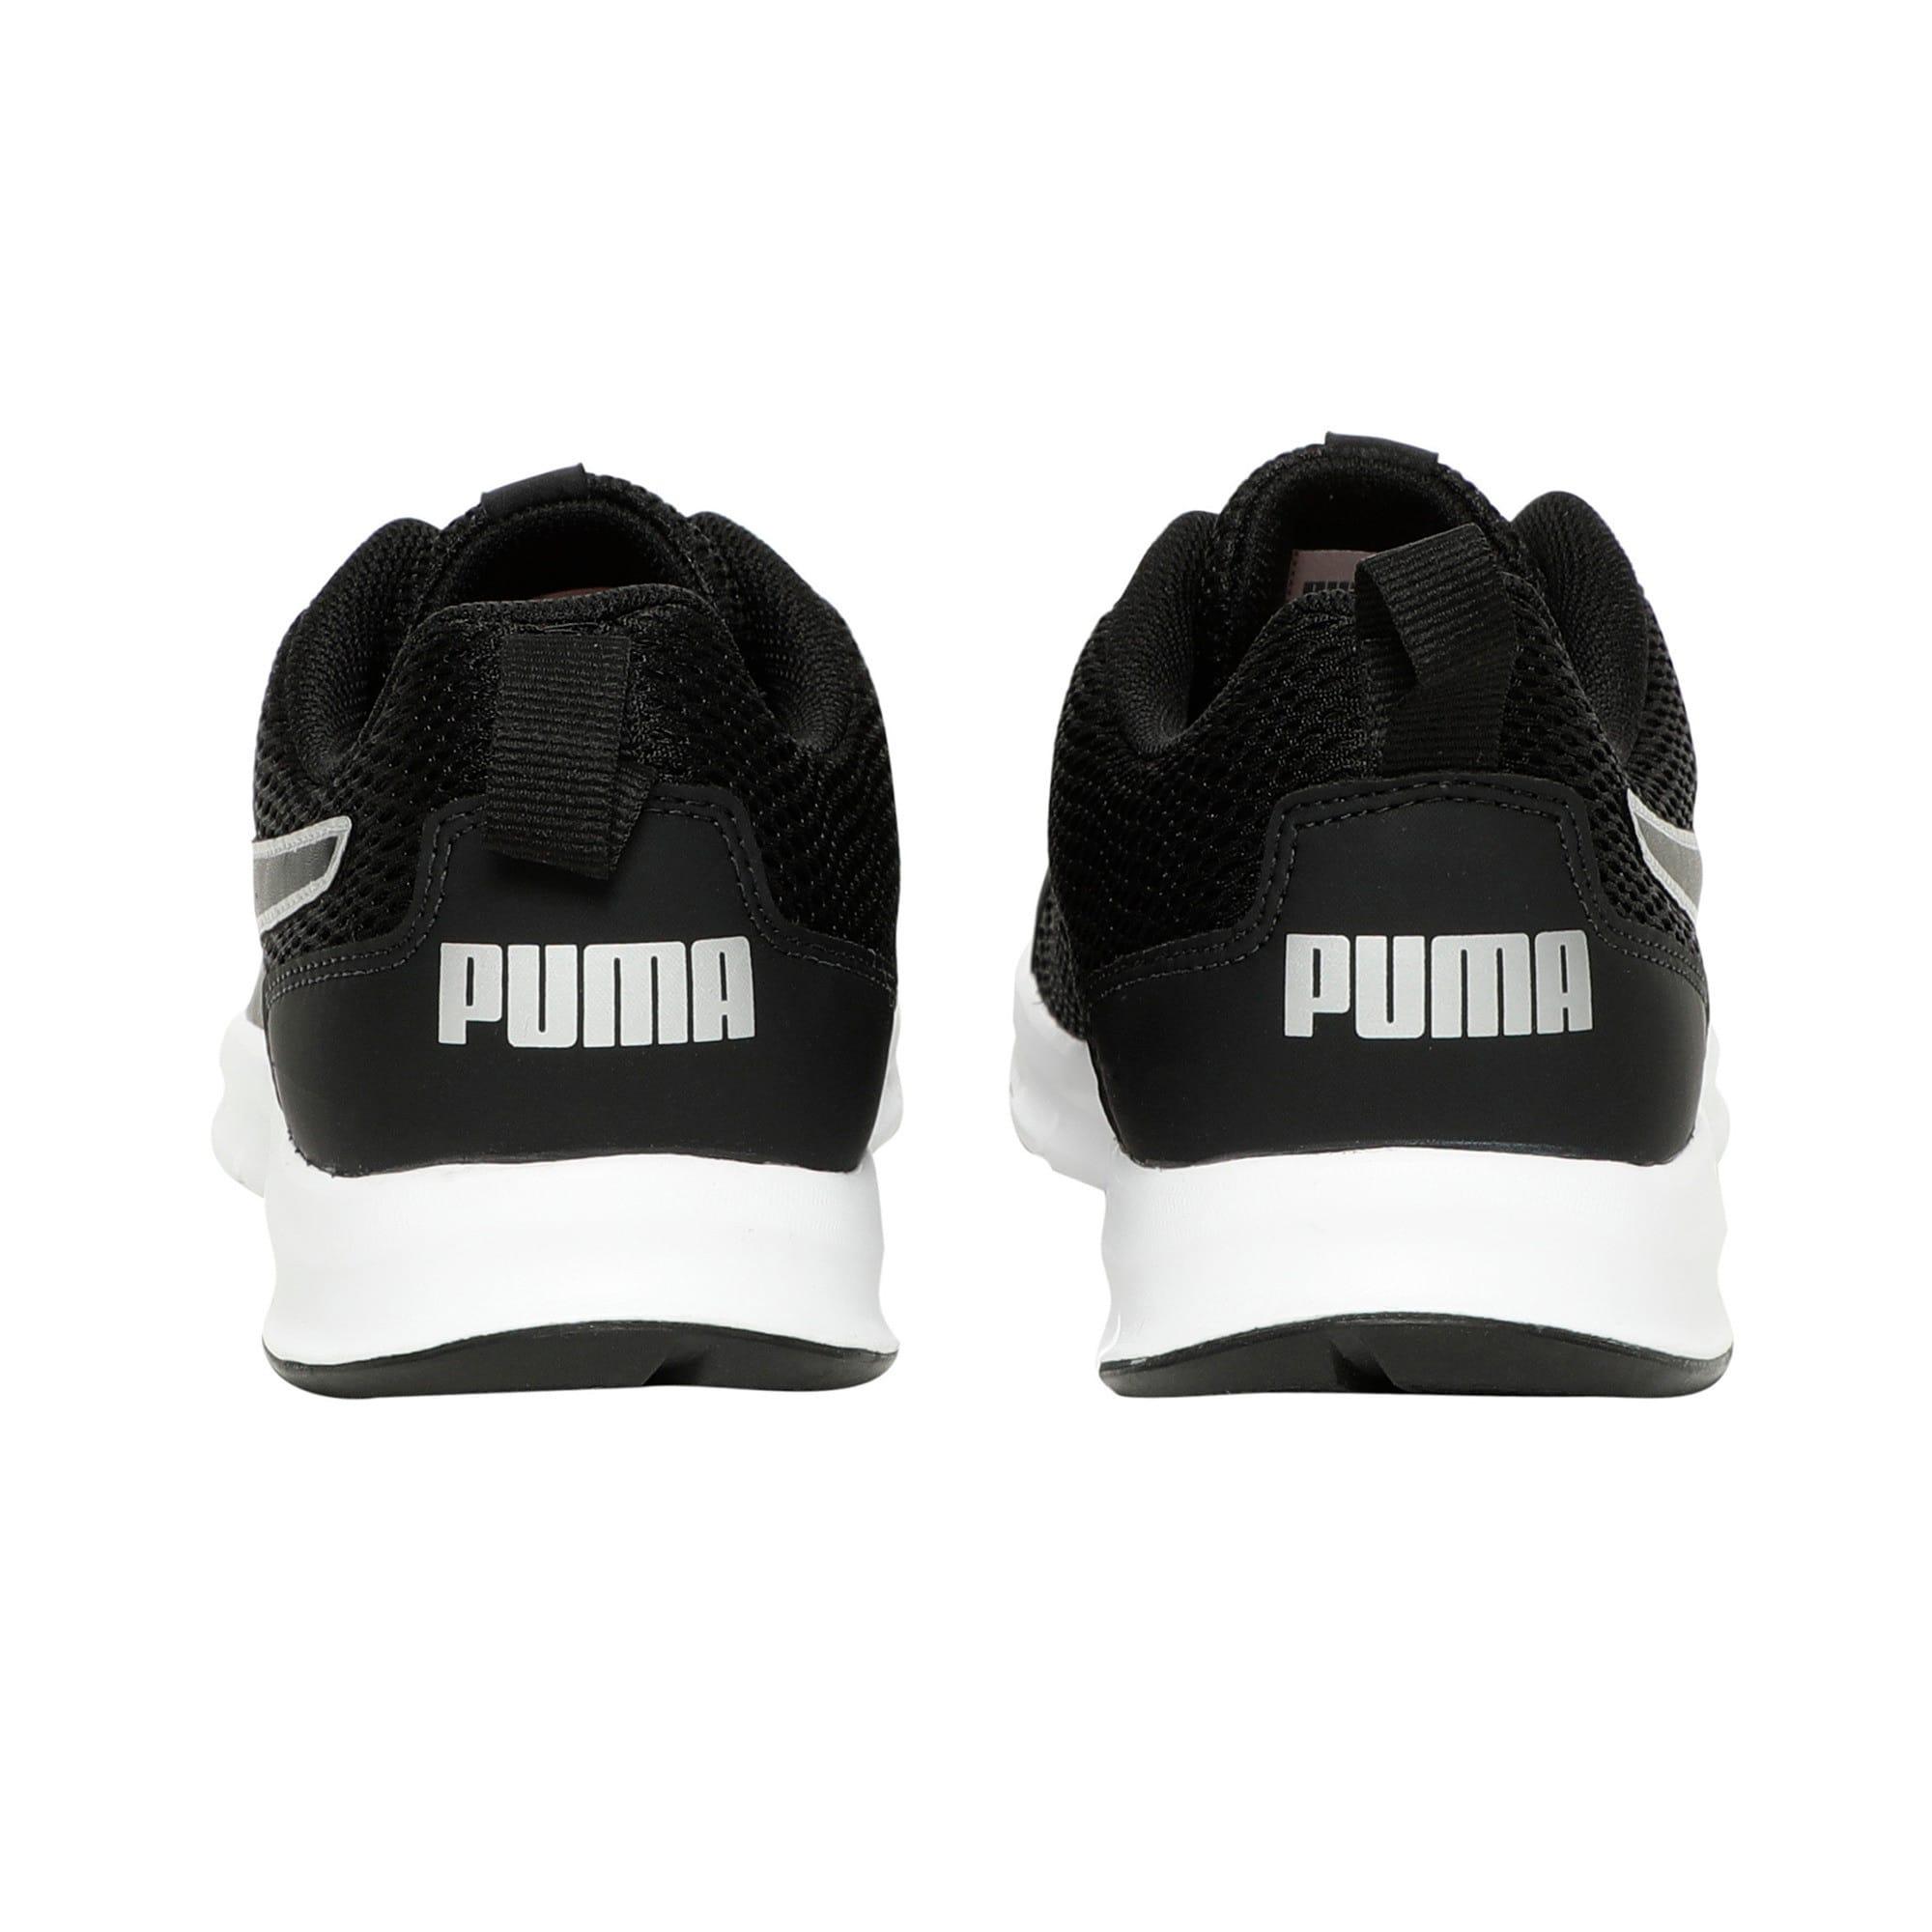 Thumbnail 3 of Rapid Runner IDP Puma Black-High Risk Re, Puma Black-Puma Silver, medium-IND